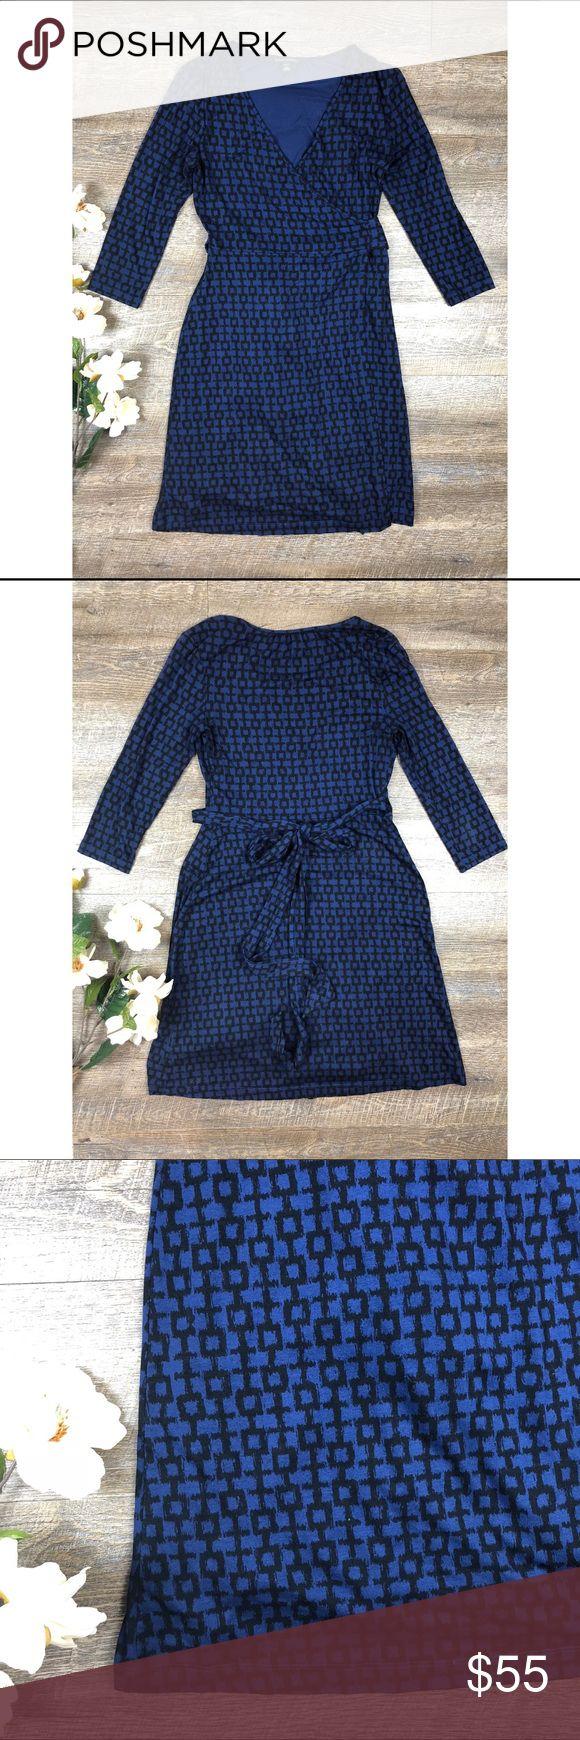 Banana Republic Wrap Dress Super cute blue Banana Republic wrap dress! In excellent condition. 50% rayon, 26% lyocell, 19% cotton, 5% spandex. Size S. E-18 Banana Republic Dresses